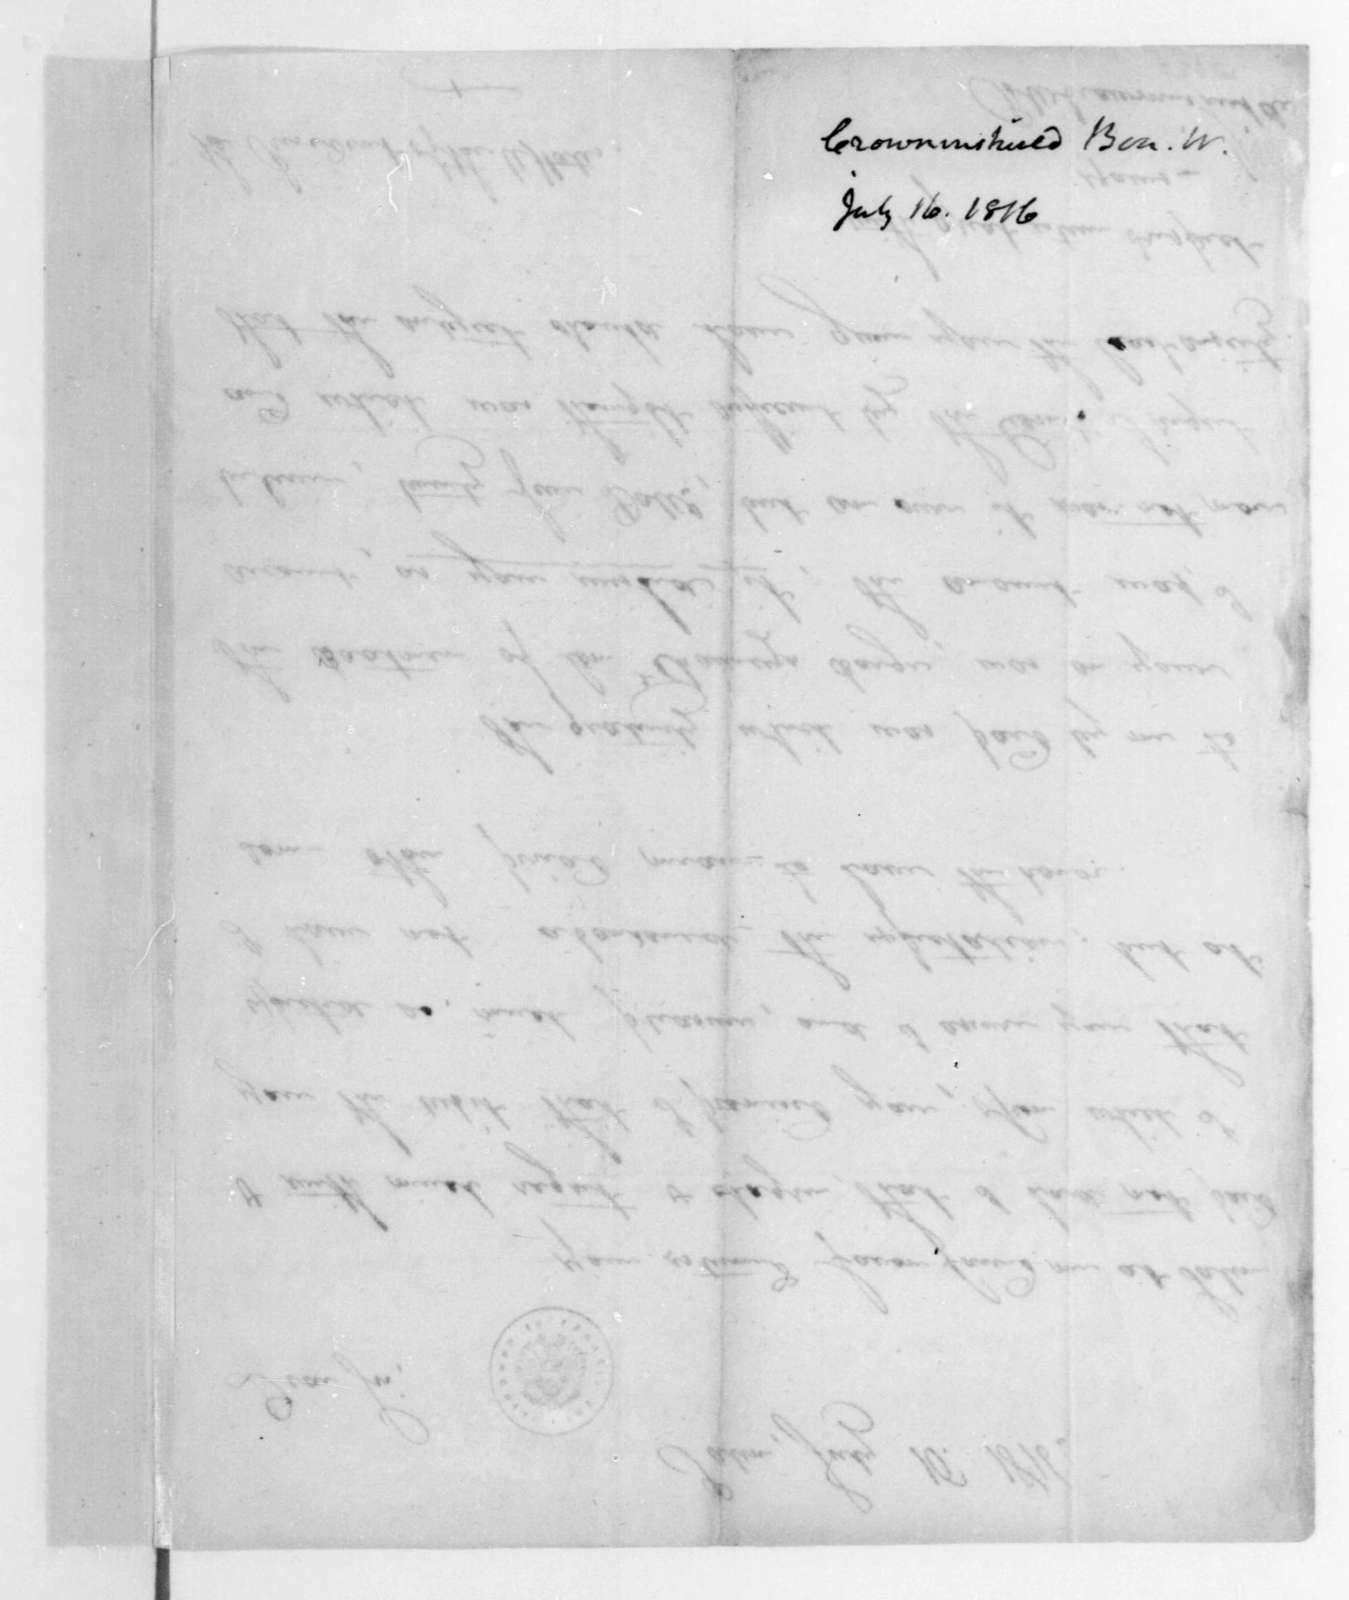 Benjamin W. Crowninshield to James Madison, July 16, 1816.